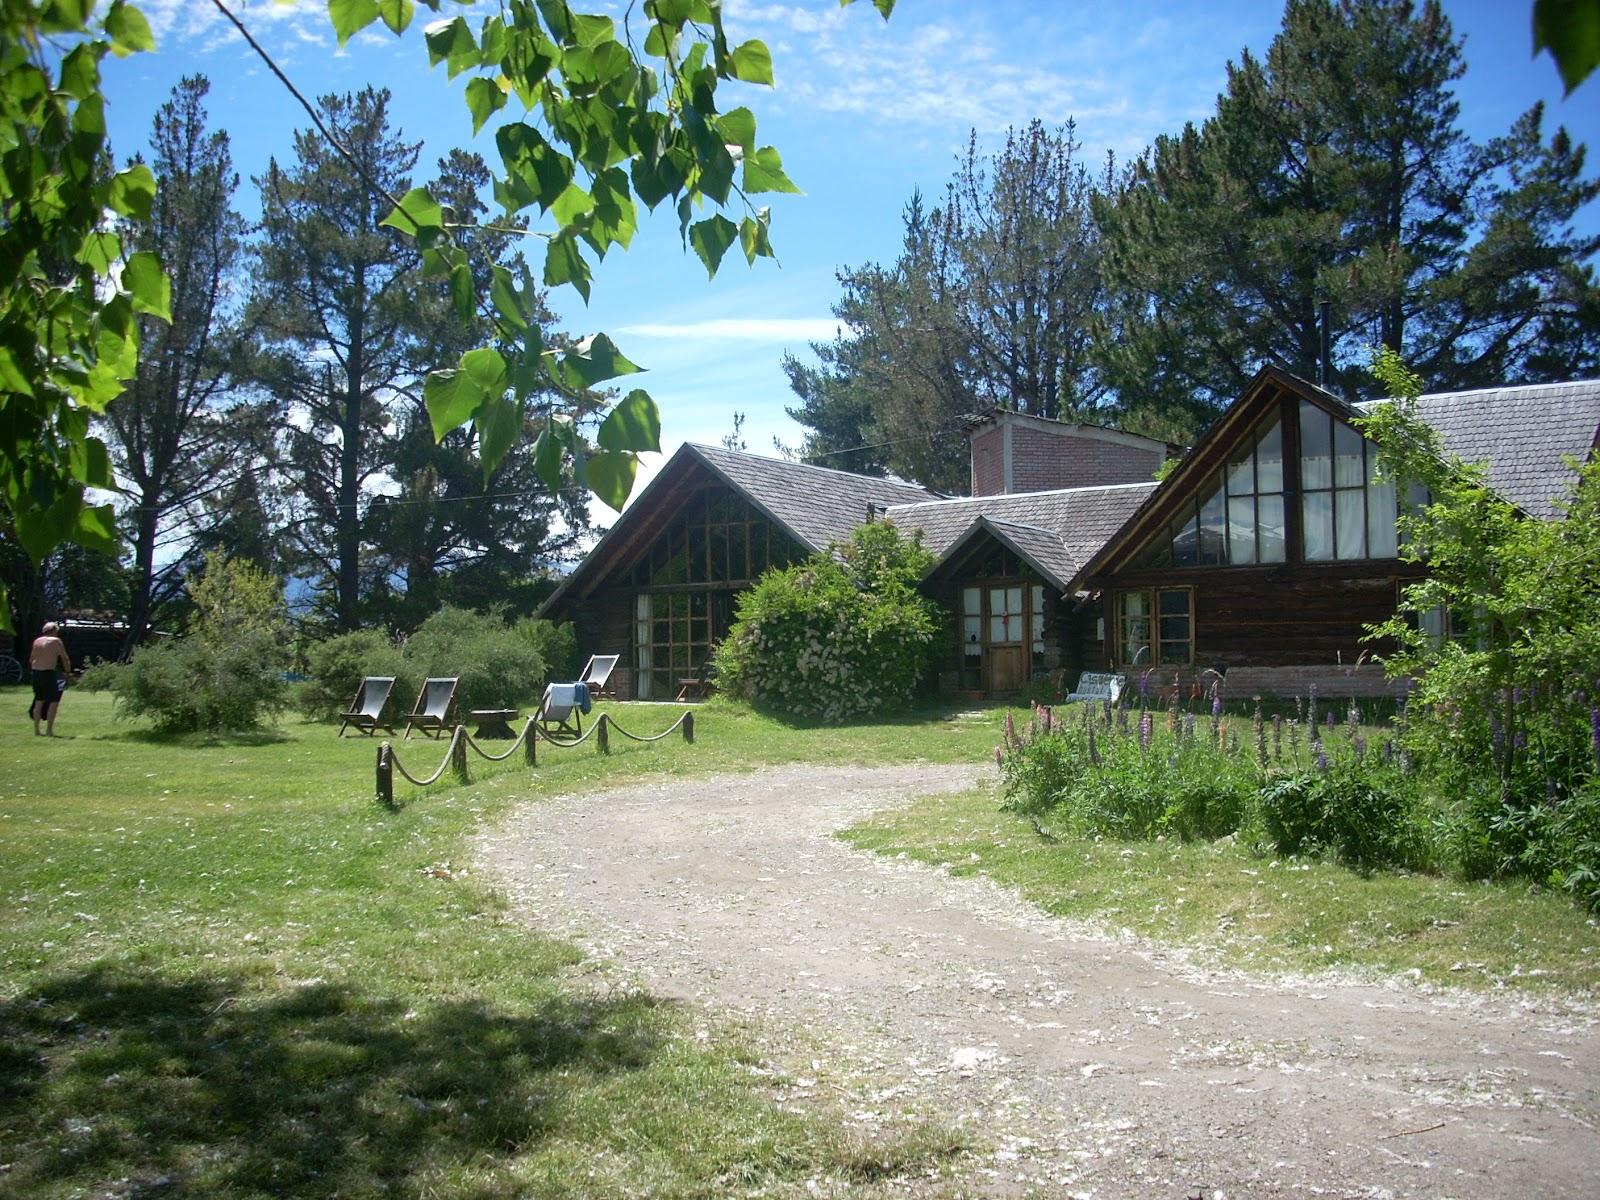 Casa Verde Hostel - highly recommended